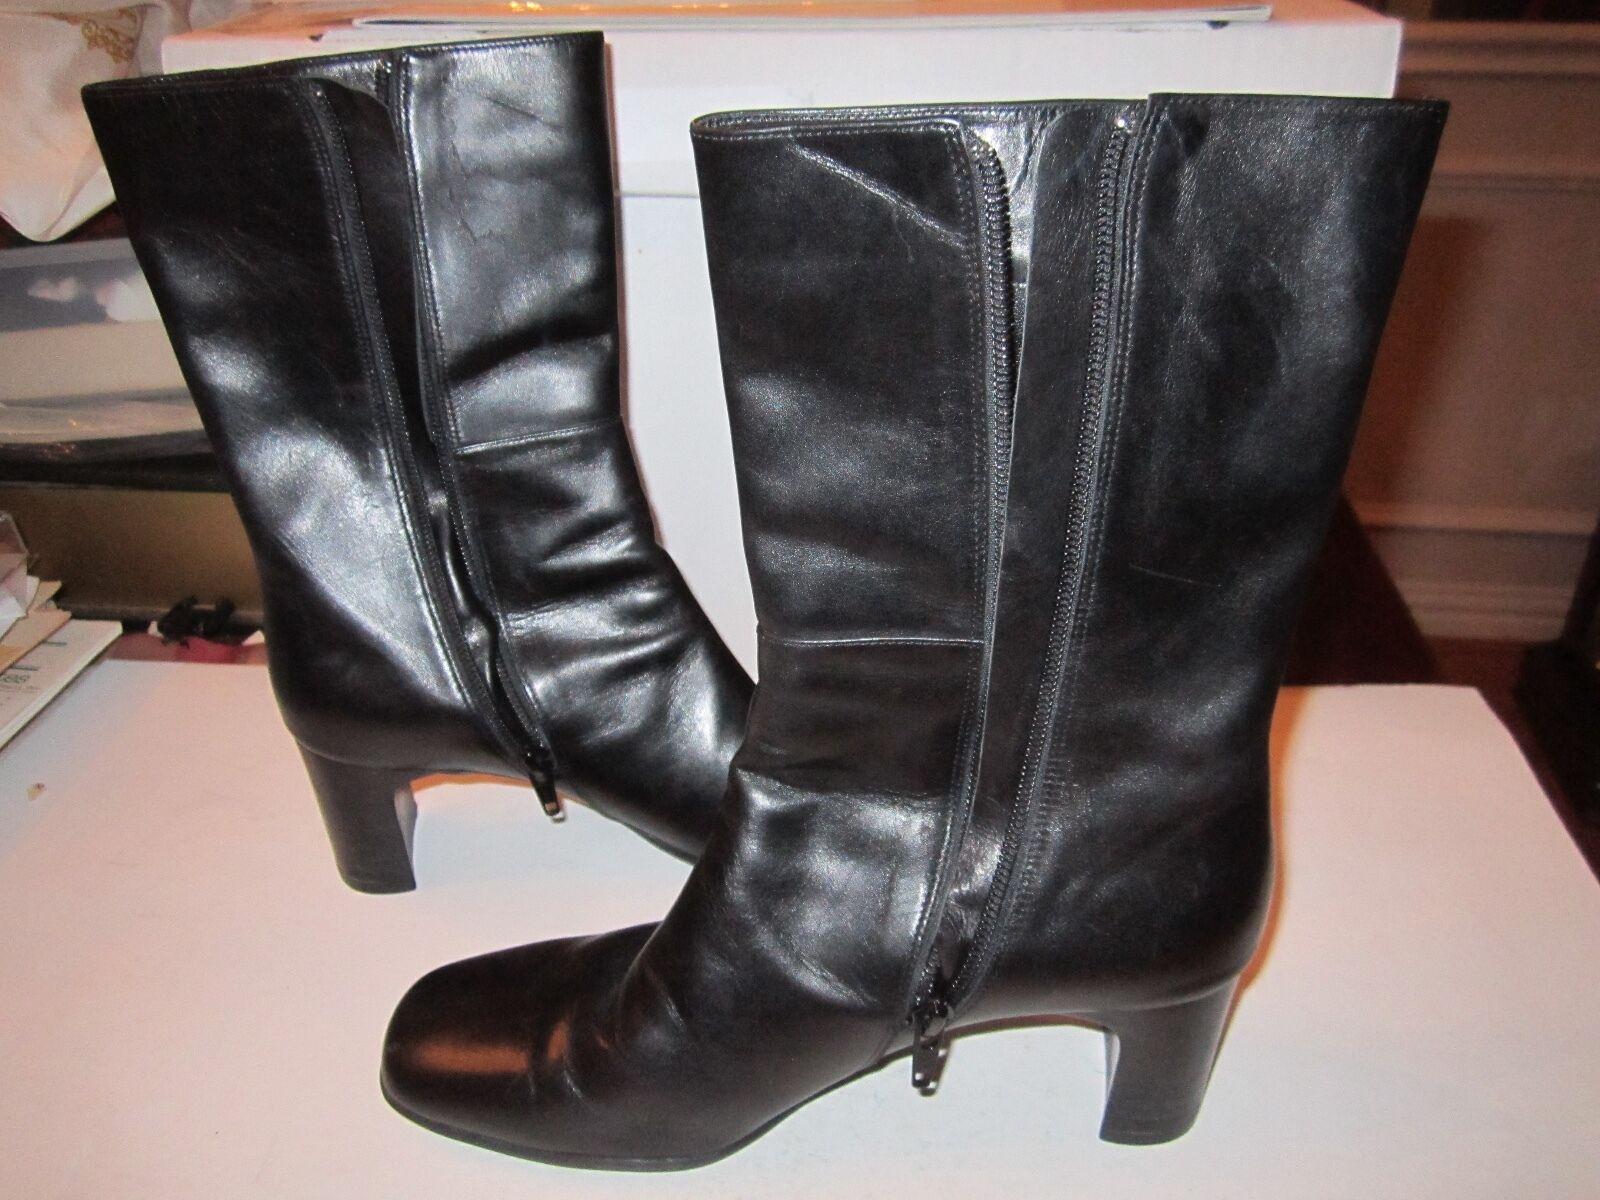 2 PAIRS OF VANELI Schuhe - BLACK BOOTS SIZE 6 1/2 & UNUSED SLINGBACKS SIZE 7 1/2